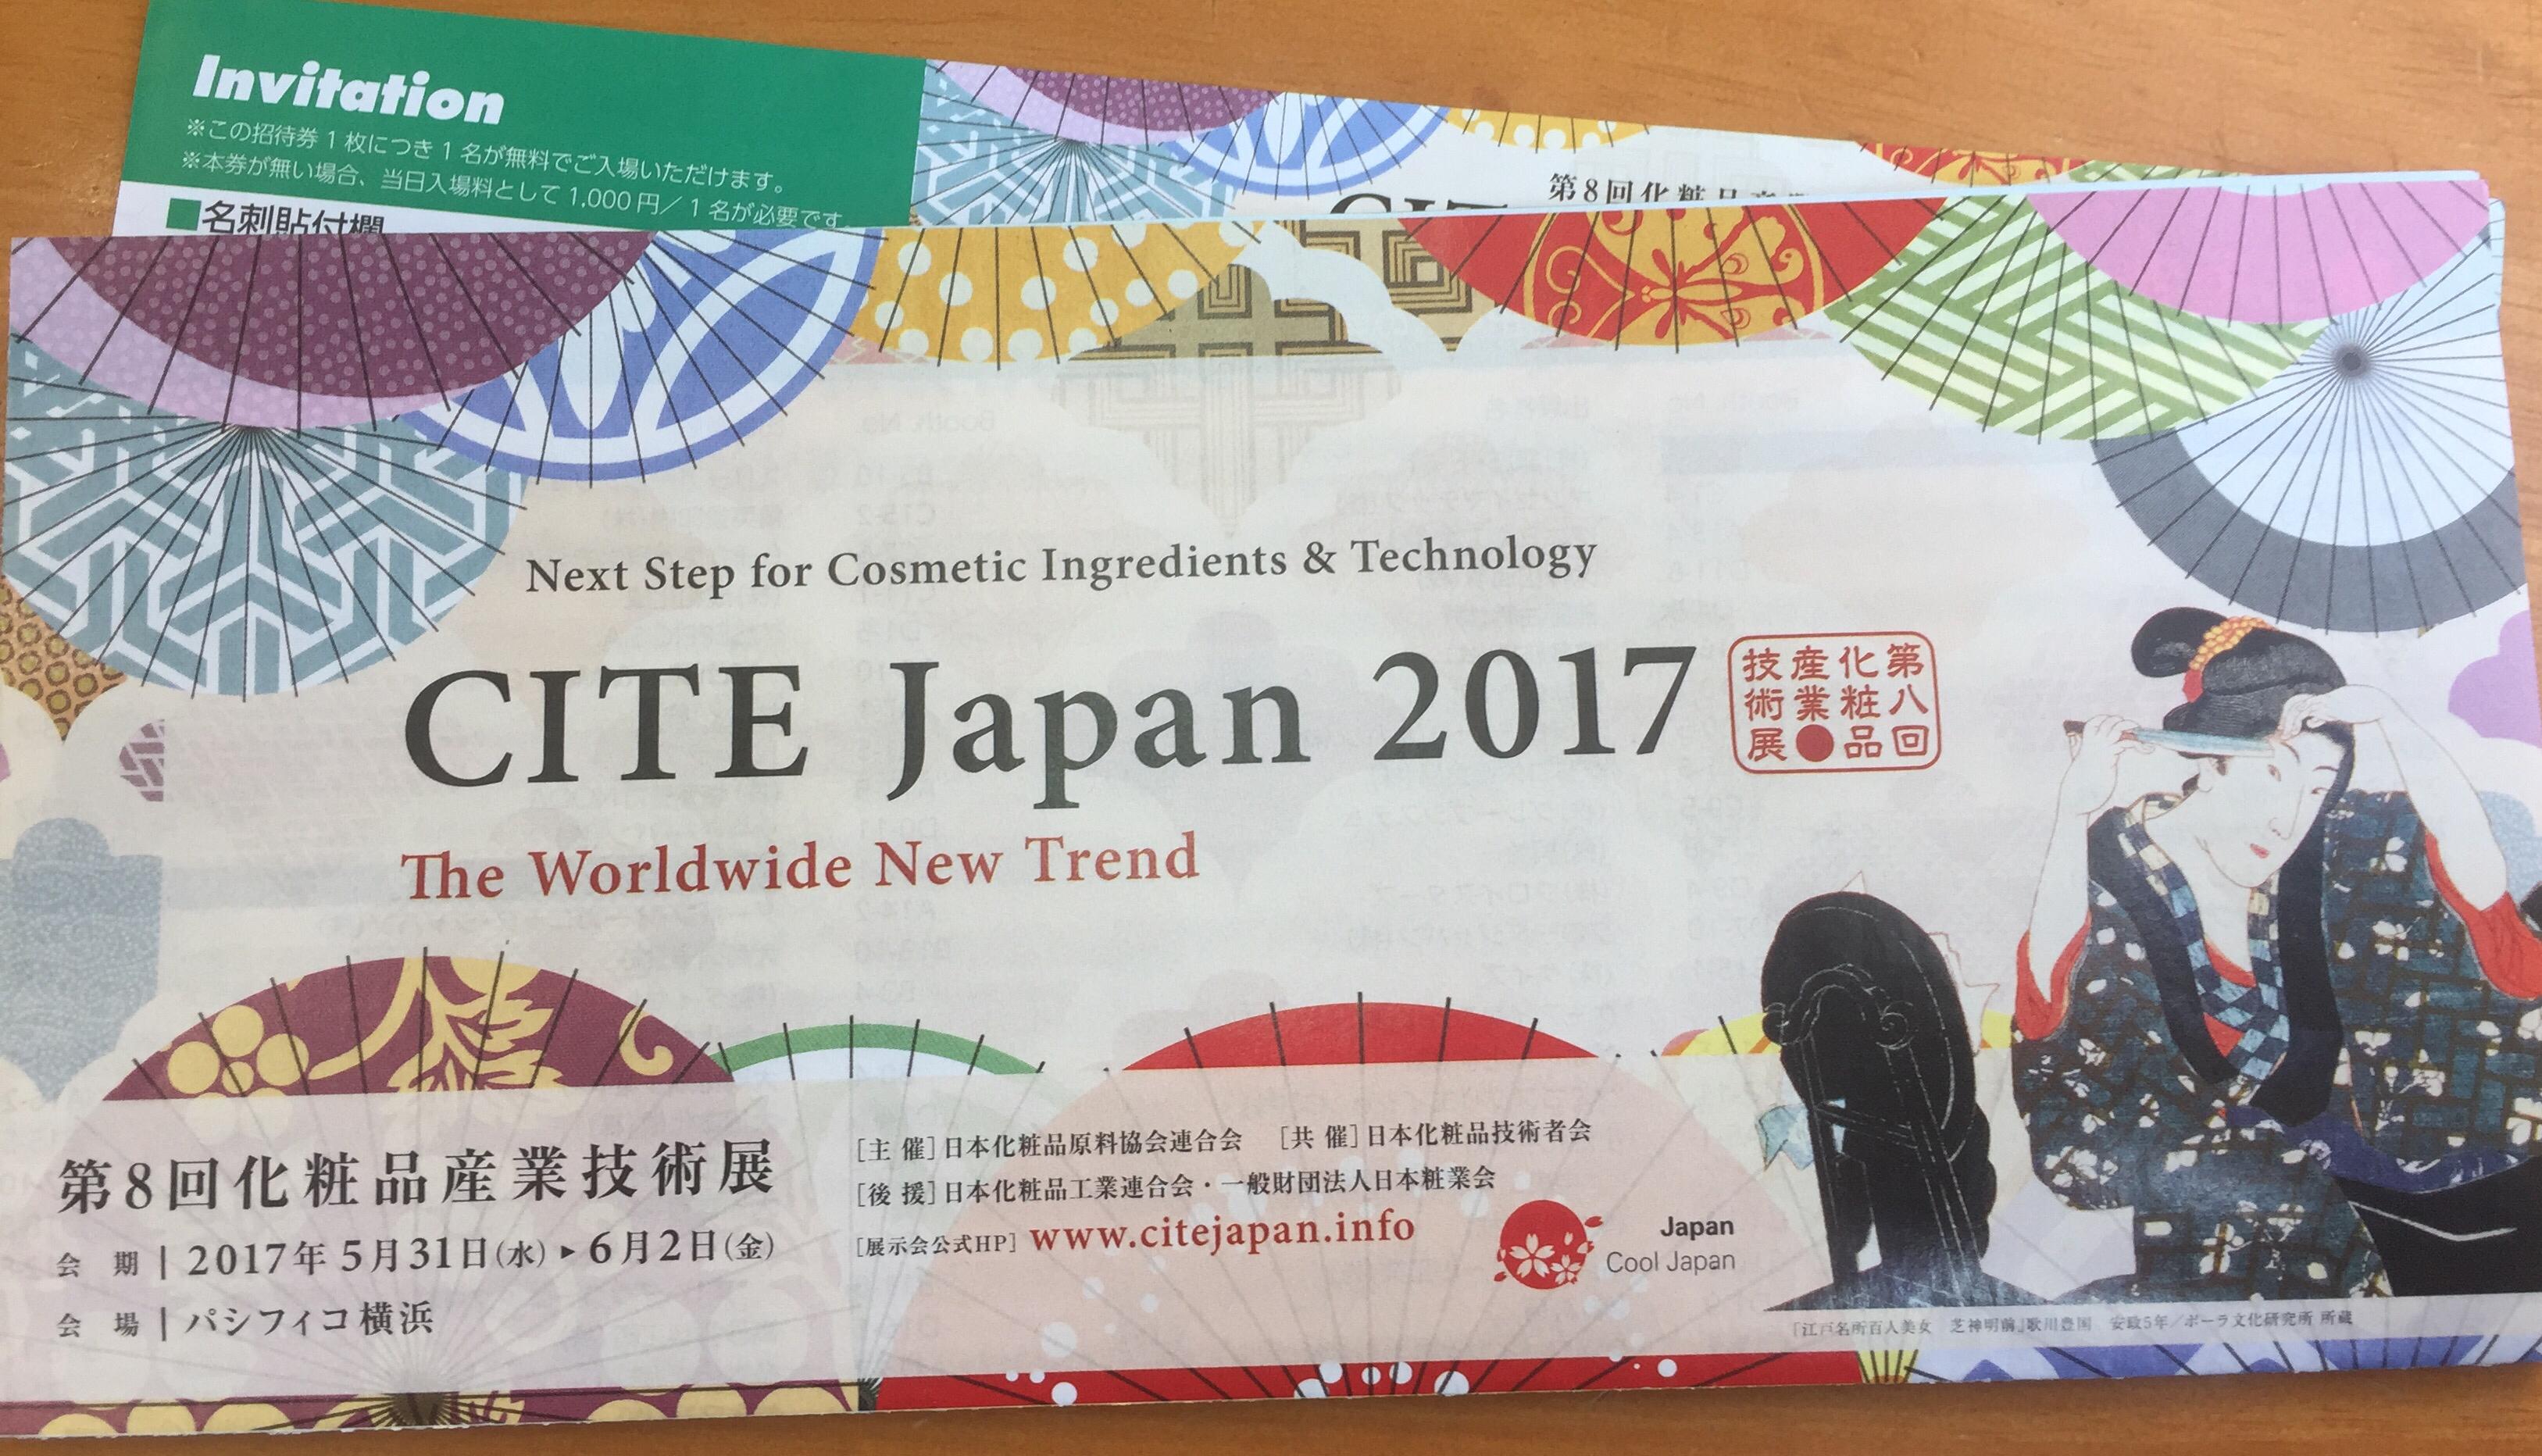 CITE Japan 2017